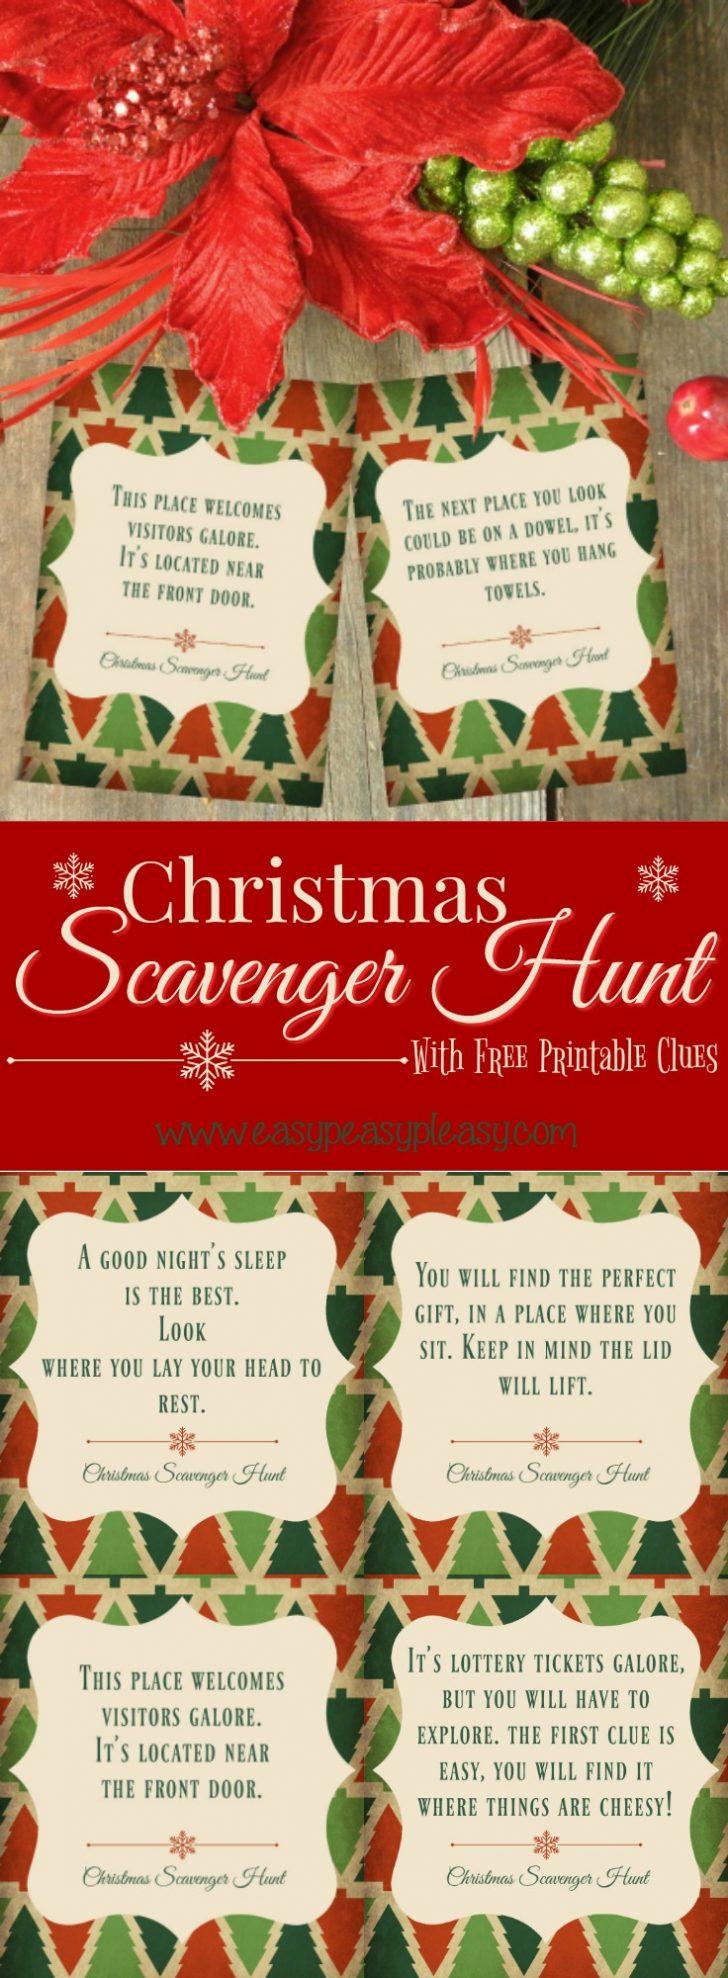 Free Printable Christmas Treasure Hunt Clues